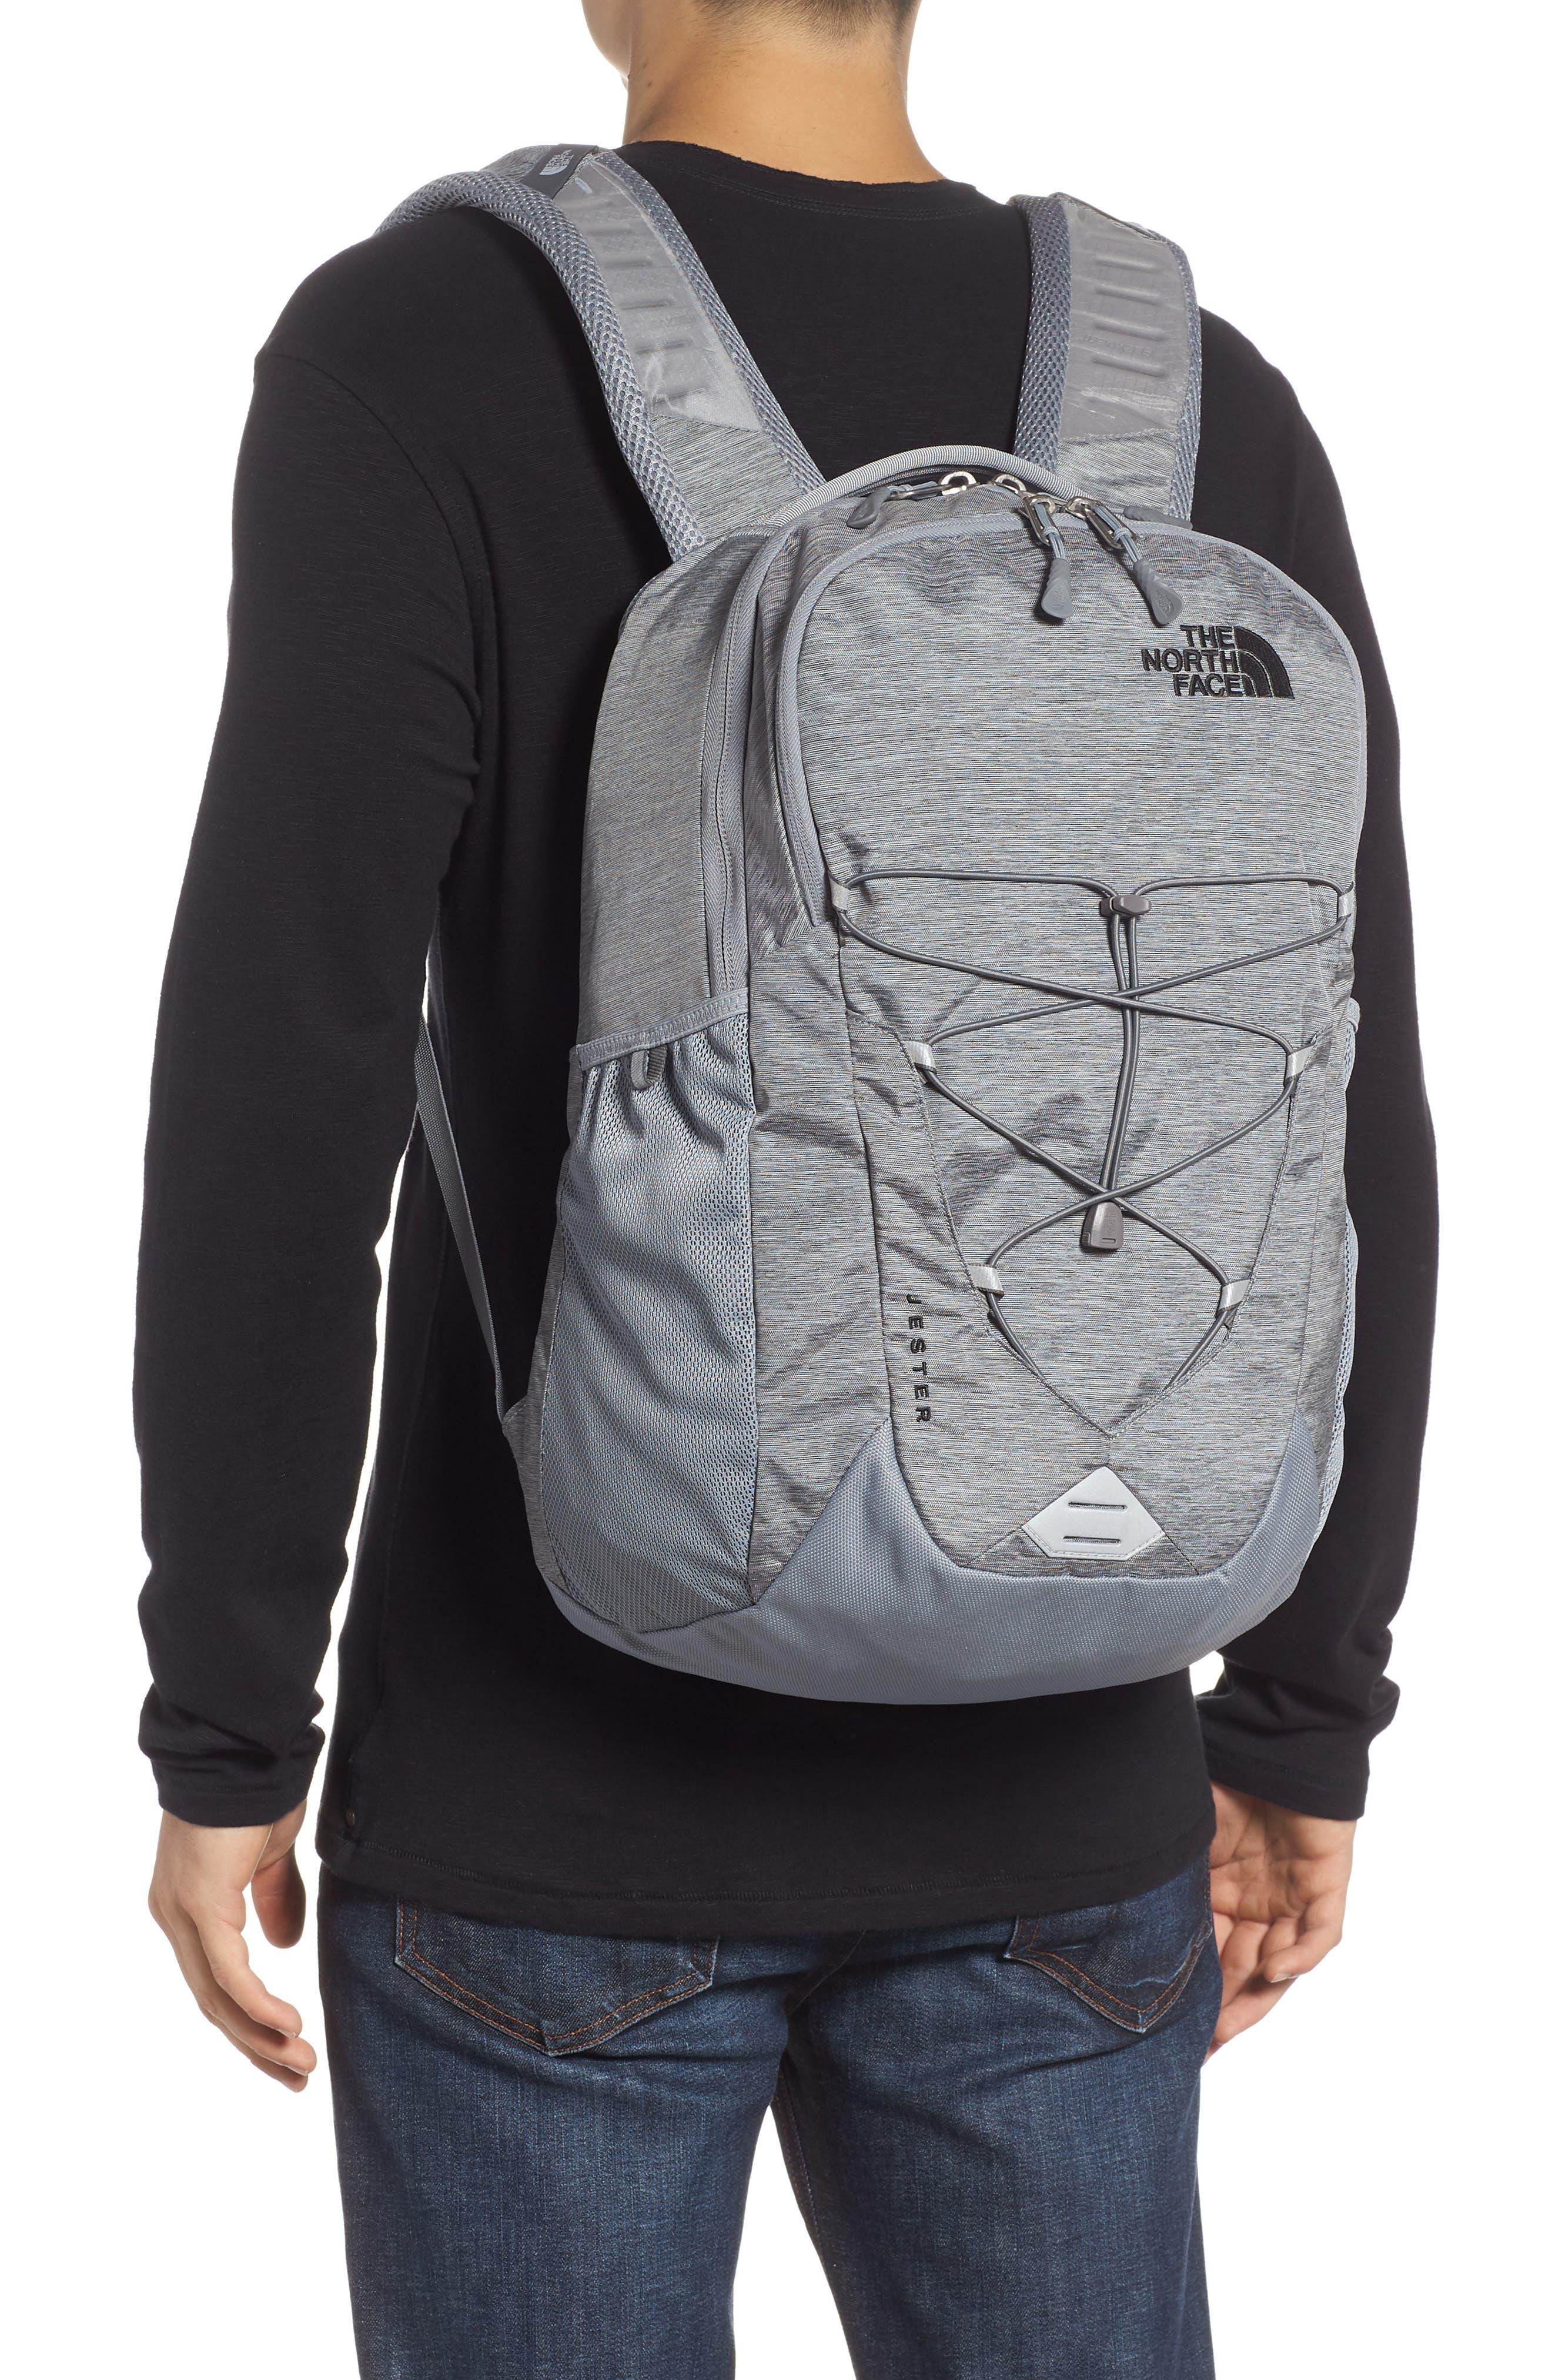 Jester Backpack,                             Alternate thumbnail 2, color,                             GREY DARK HEATHER/ TNF BLACK